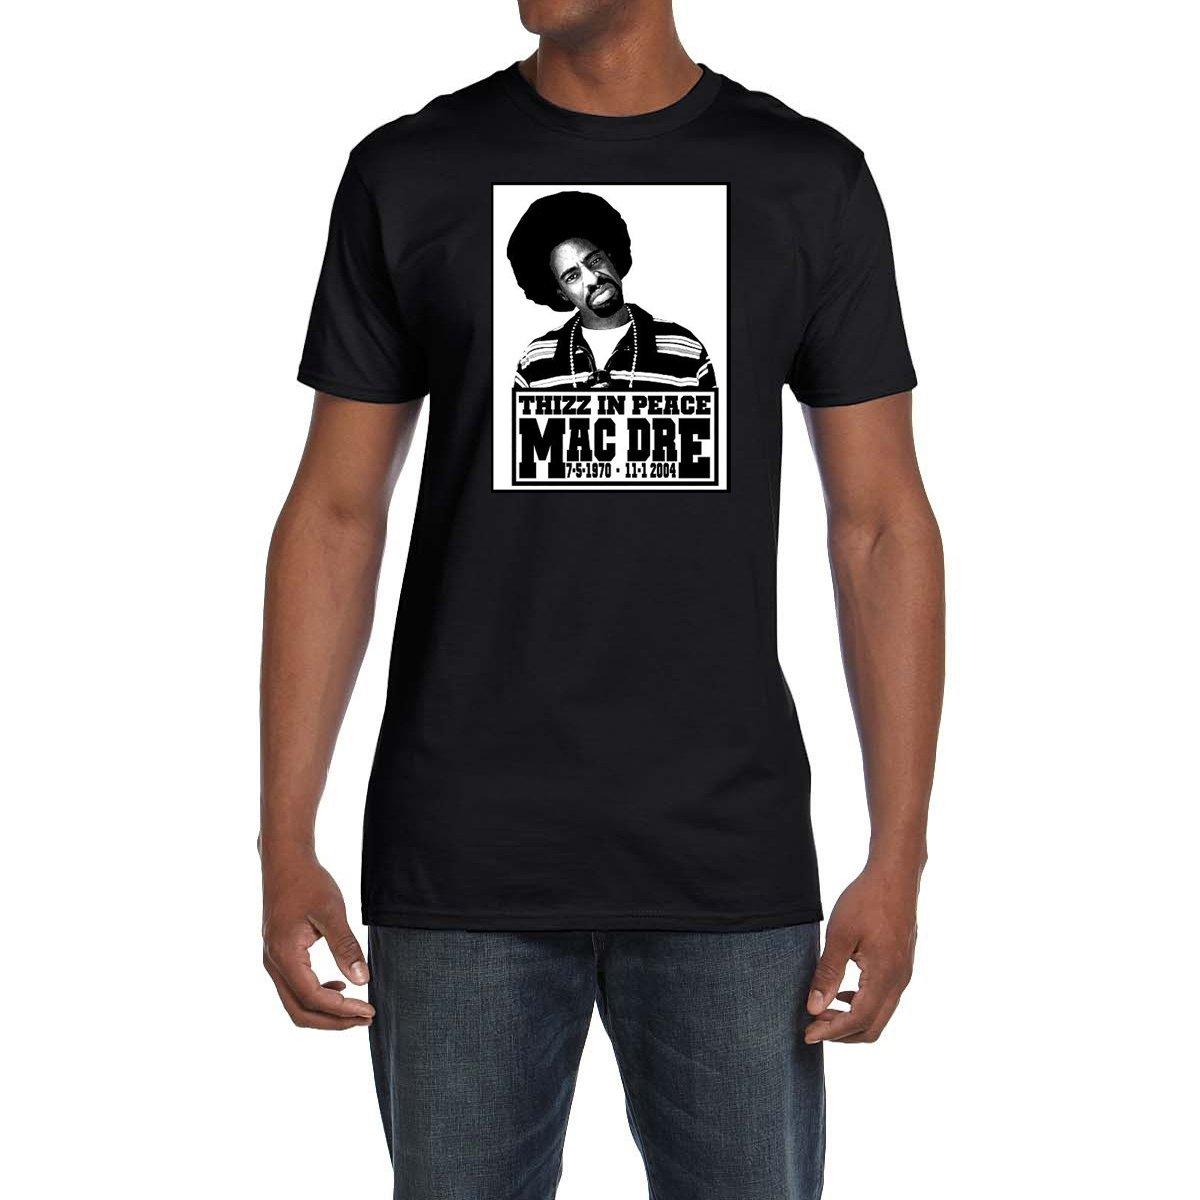 Amazon com: Mac Dre Thizz In Peace T Shirt Classic Hip Hop Bay Area